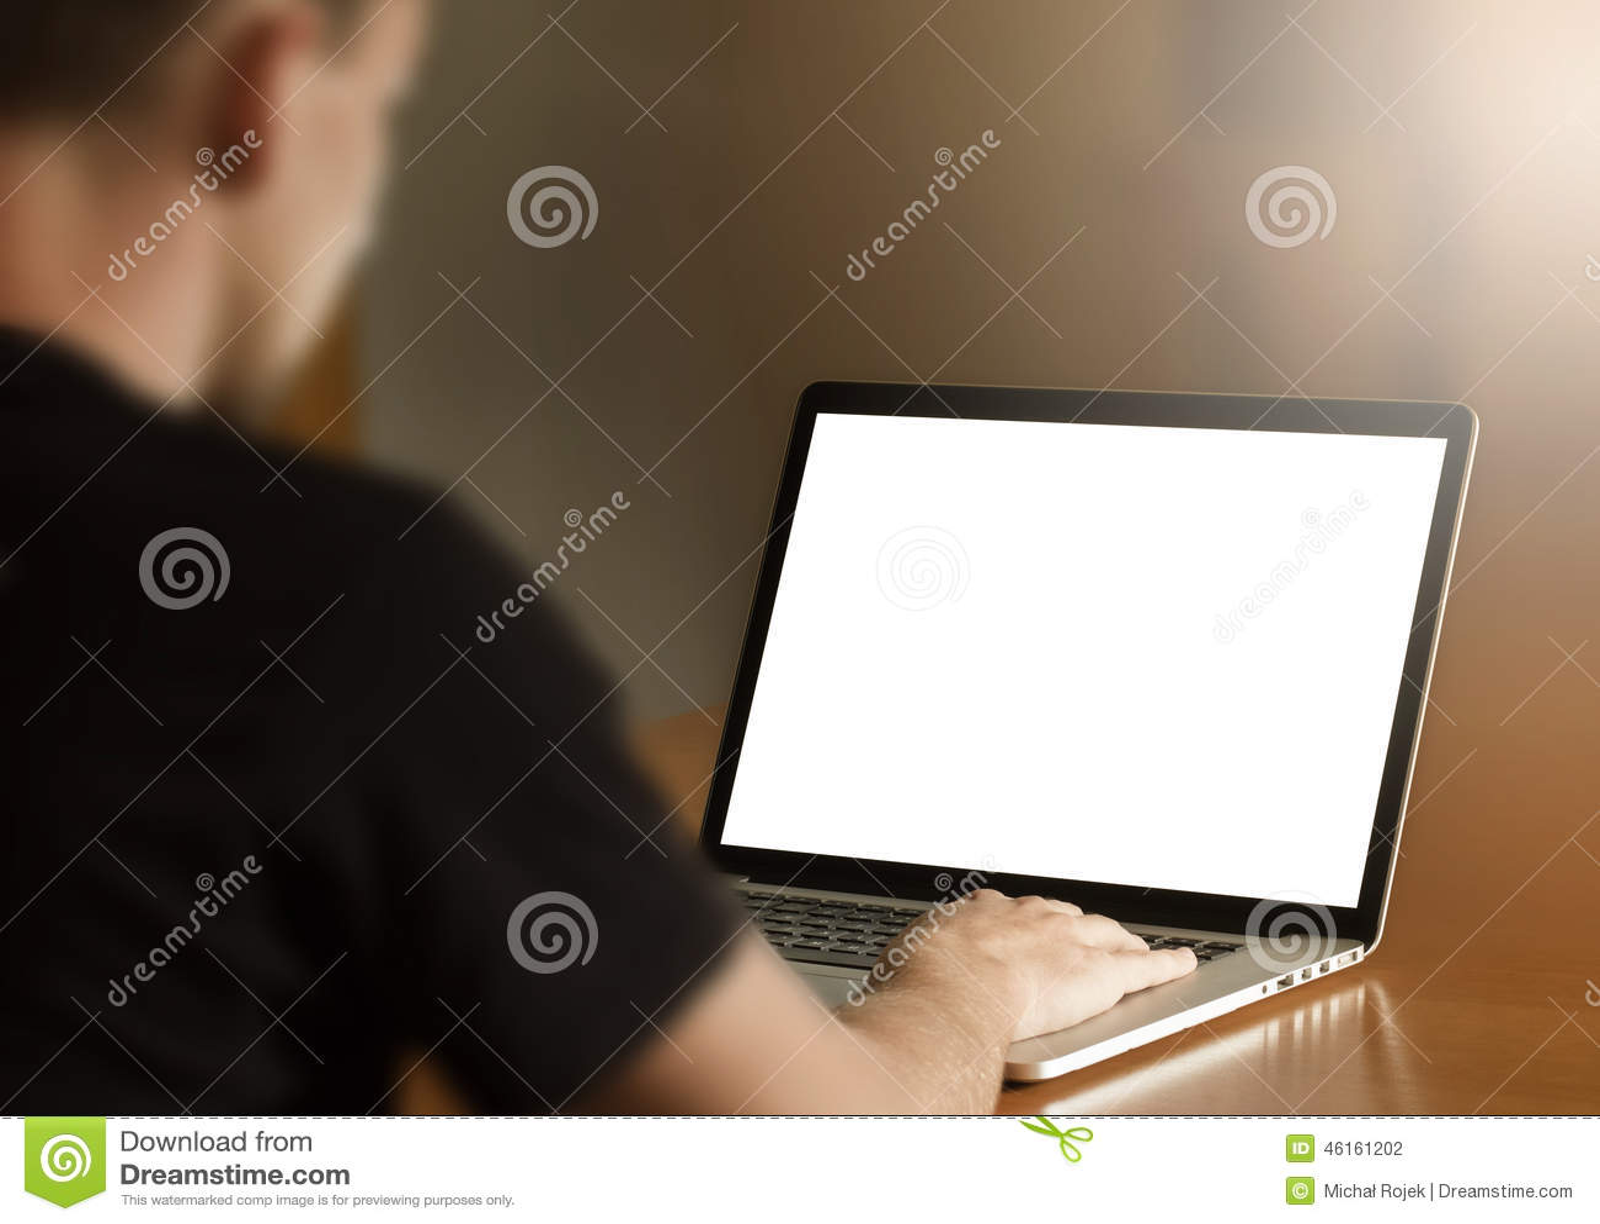 Man using notebook